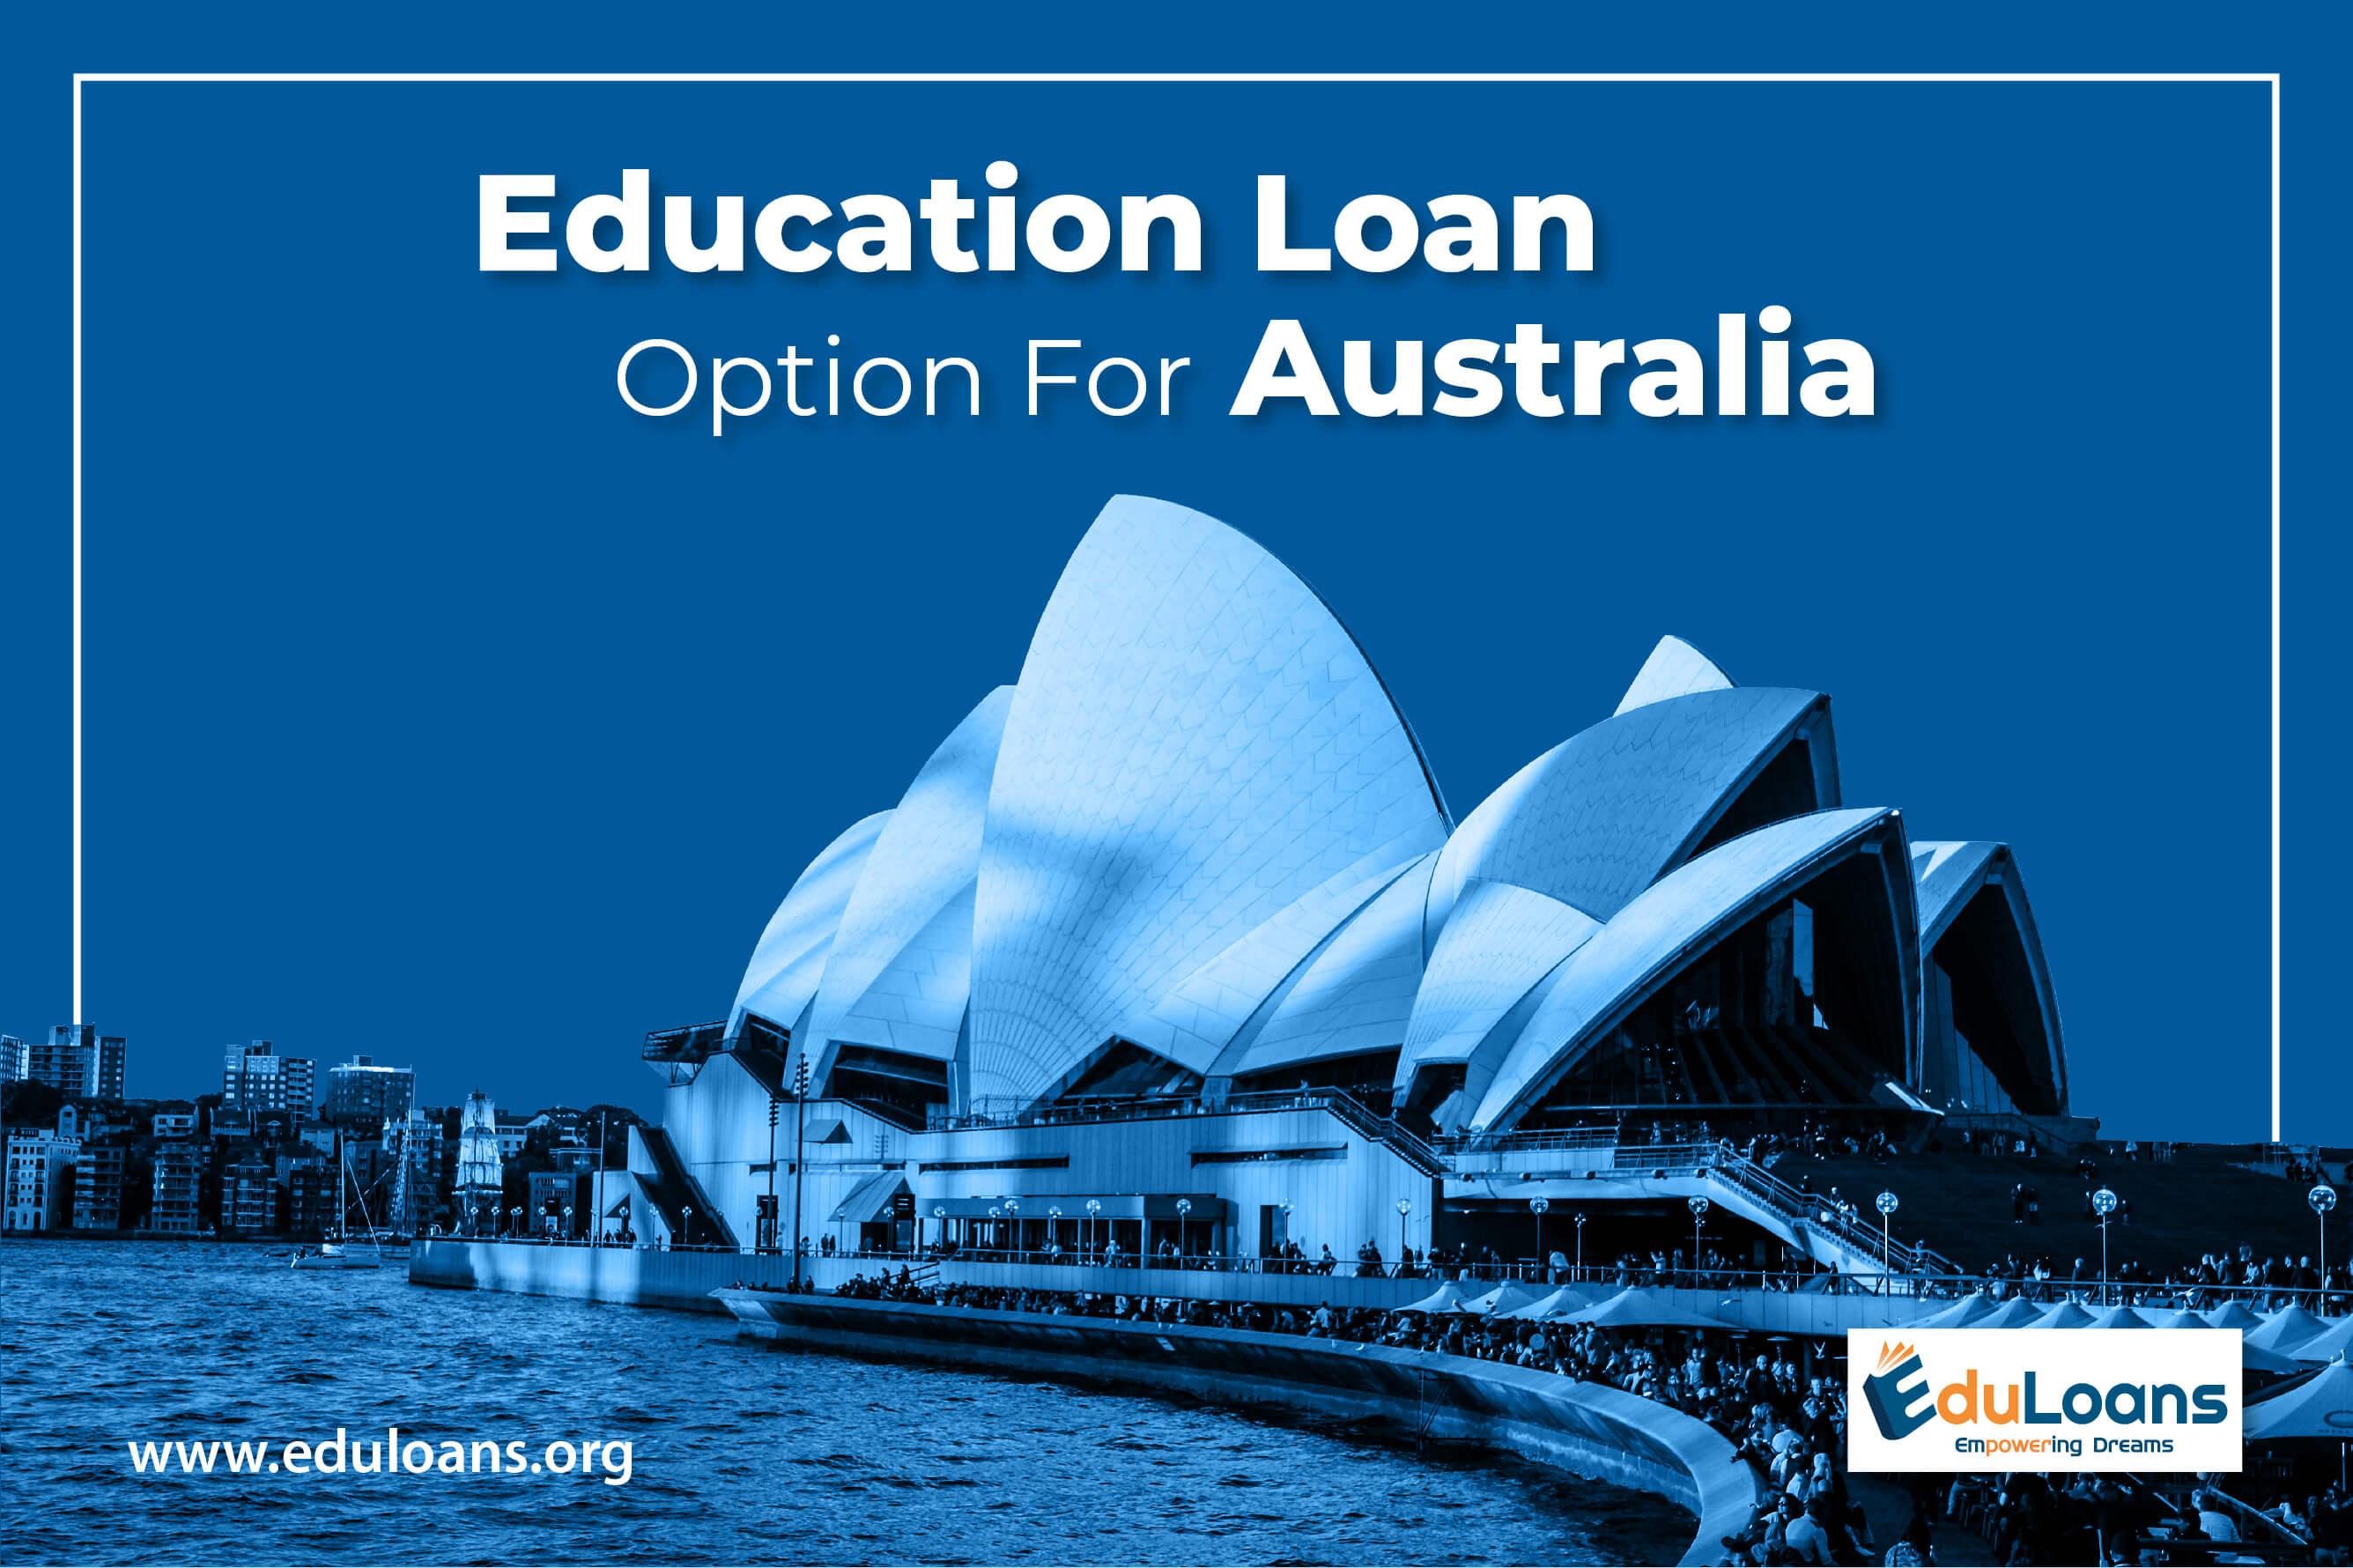 Education loan options for Australia